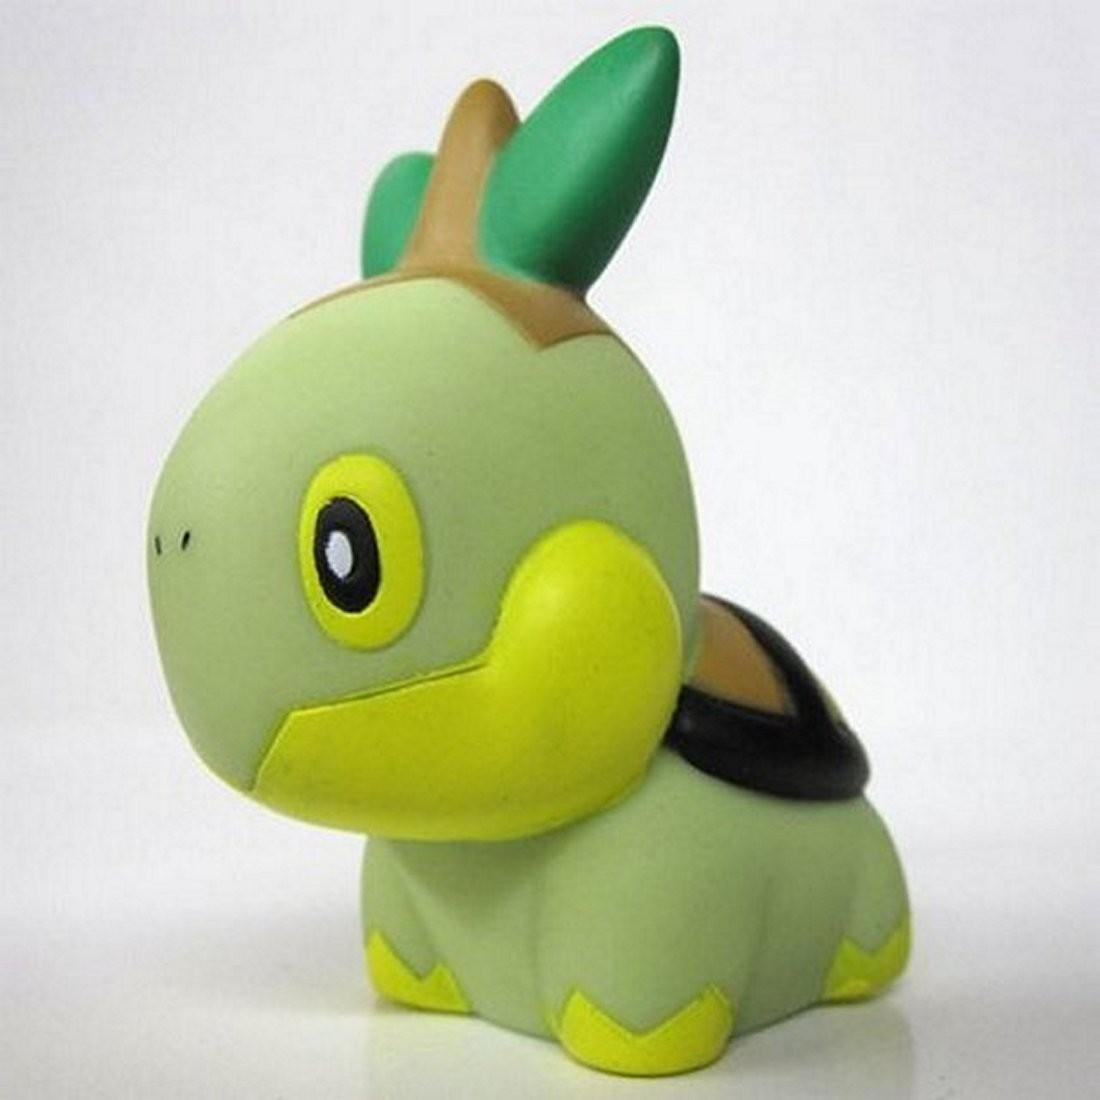 Squishy Pokemon Gashapon : Pokemon Diamond & Pearl Gashapon Squeeze Figure-Turtwig eBay